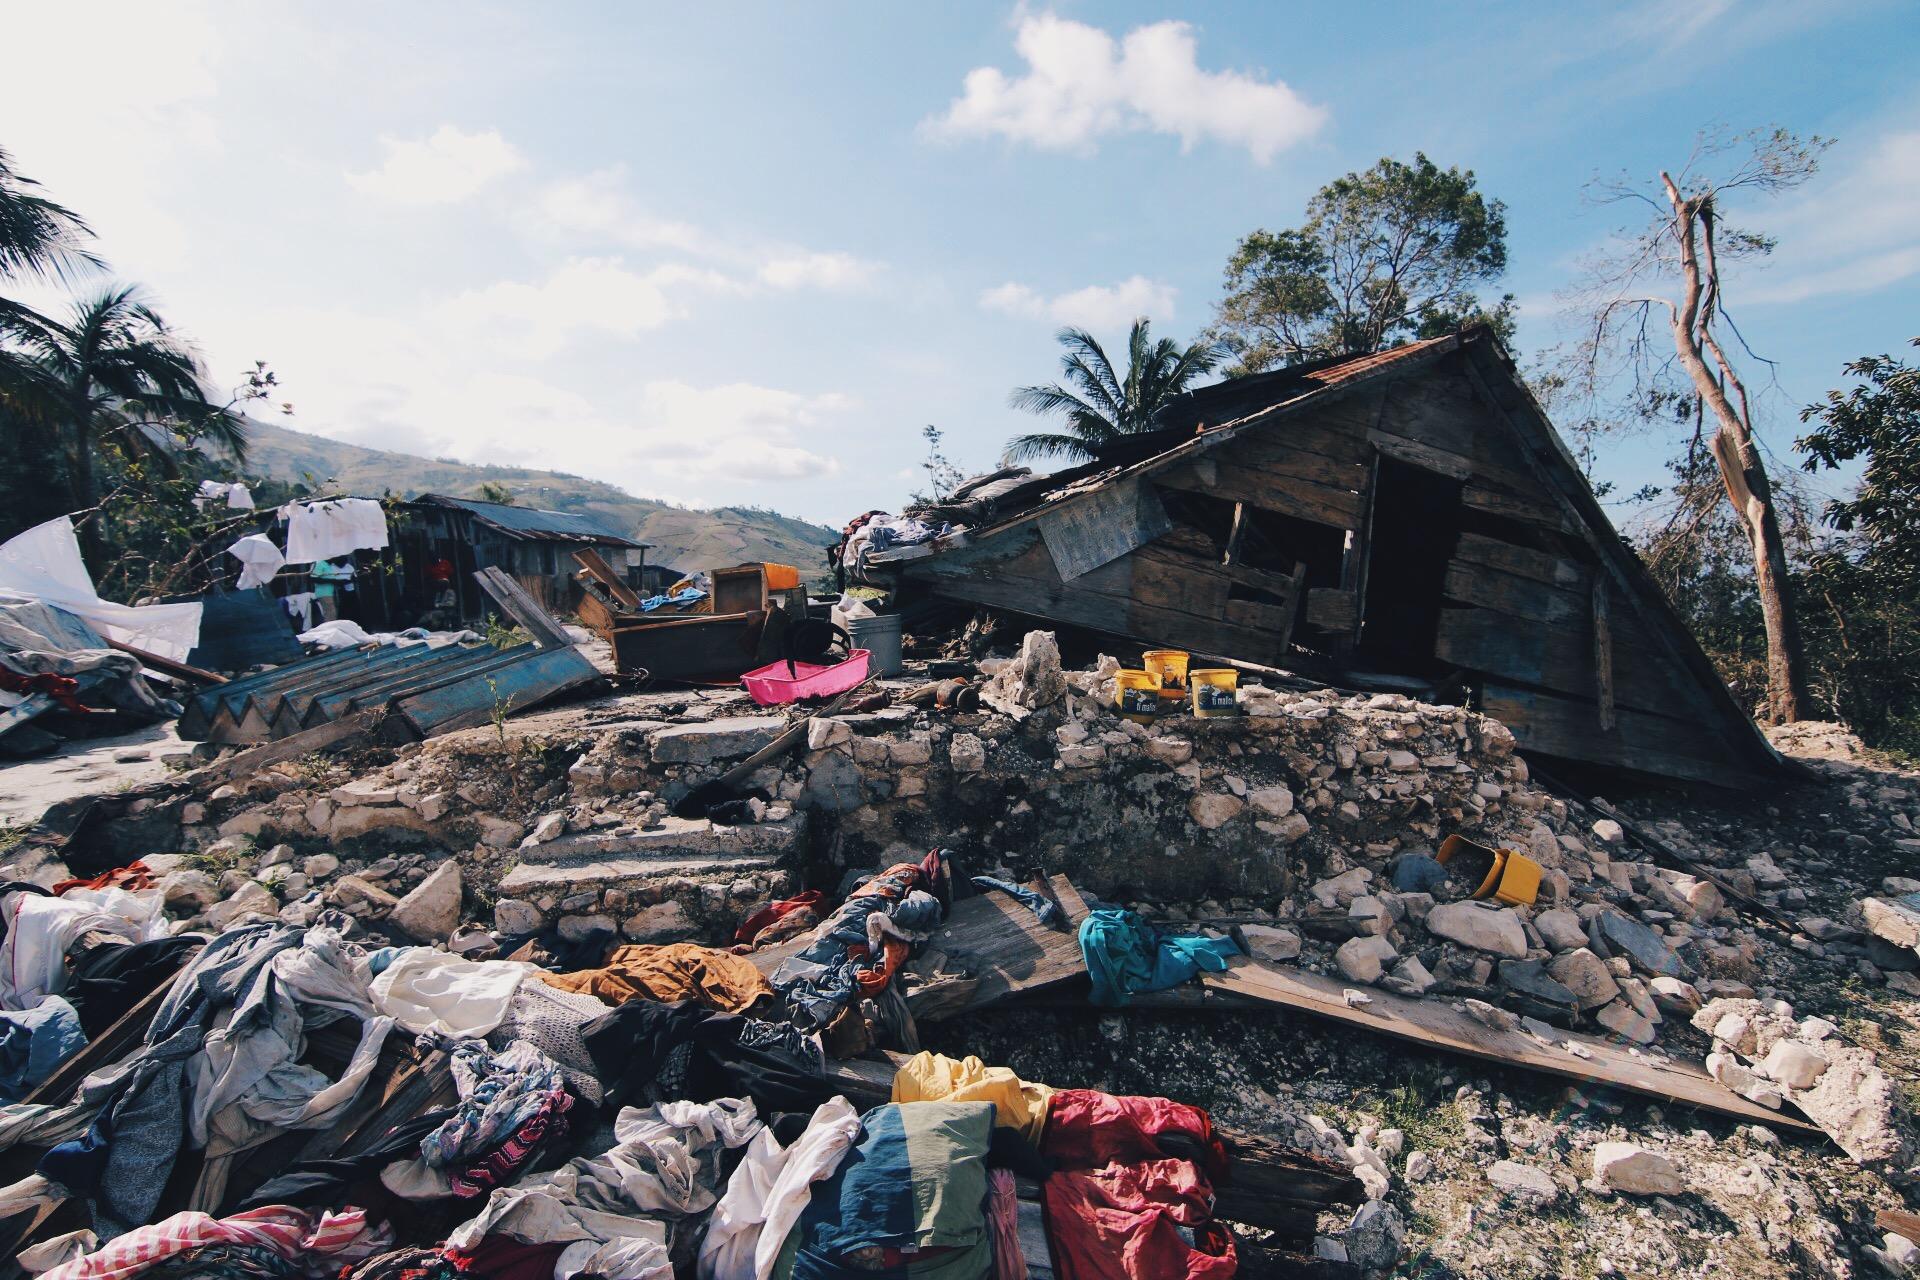 Stora summor till haiti